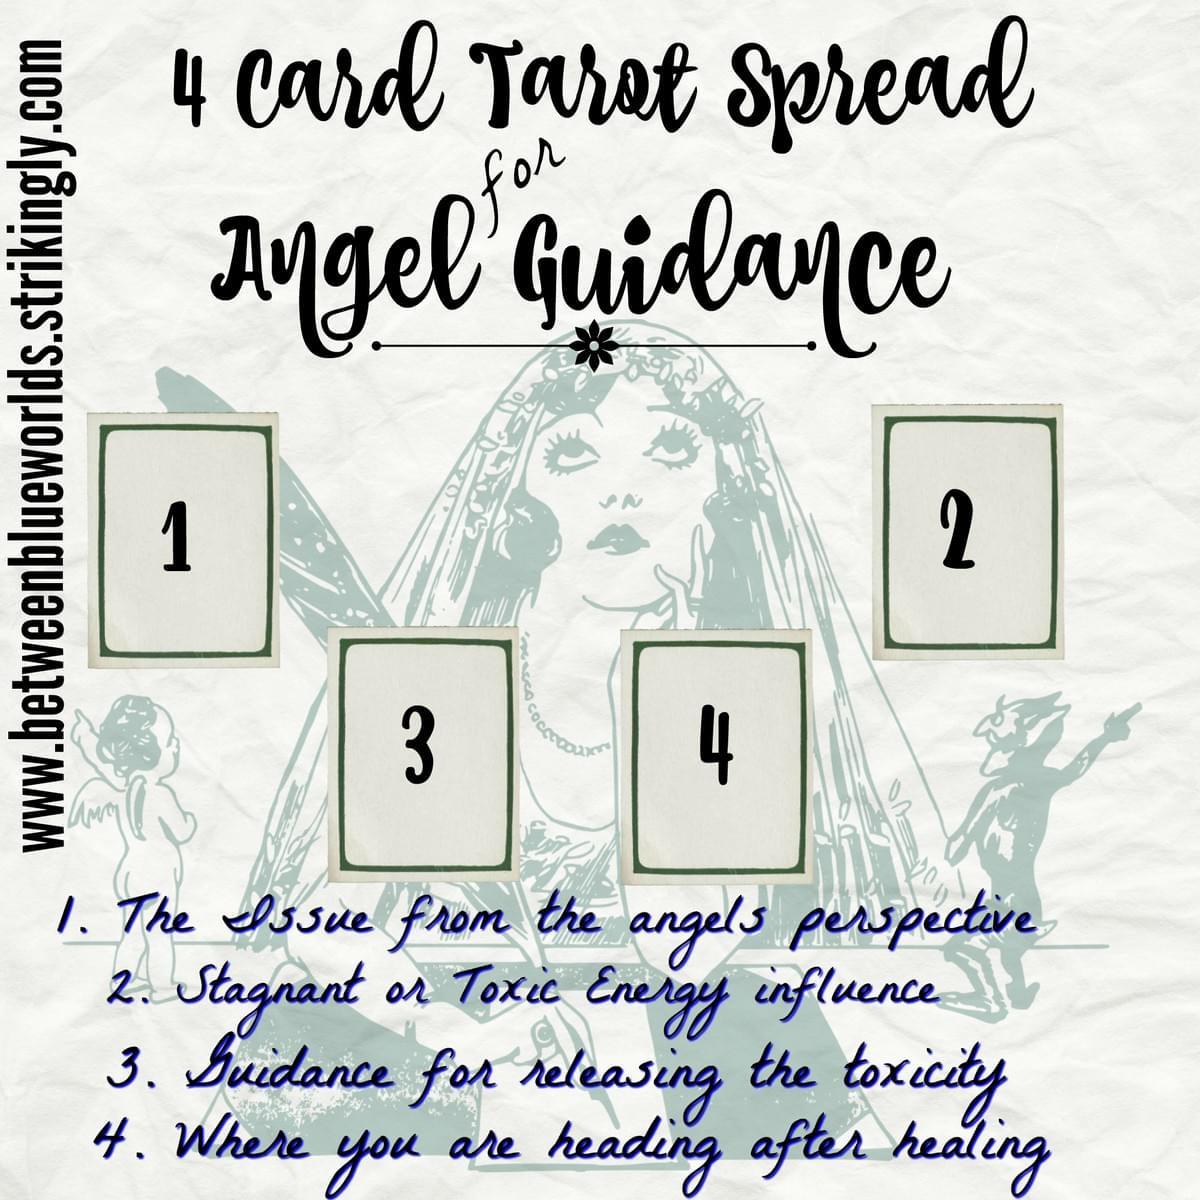 4 Card Tarot Spread For Angel Guidance - Tarot Spreads